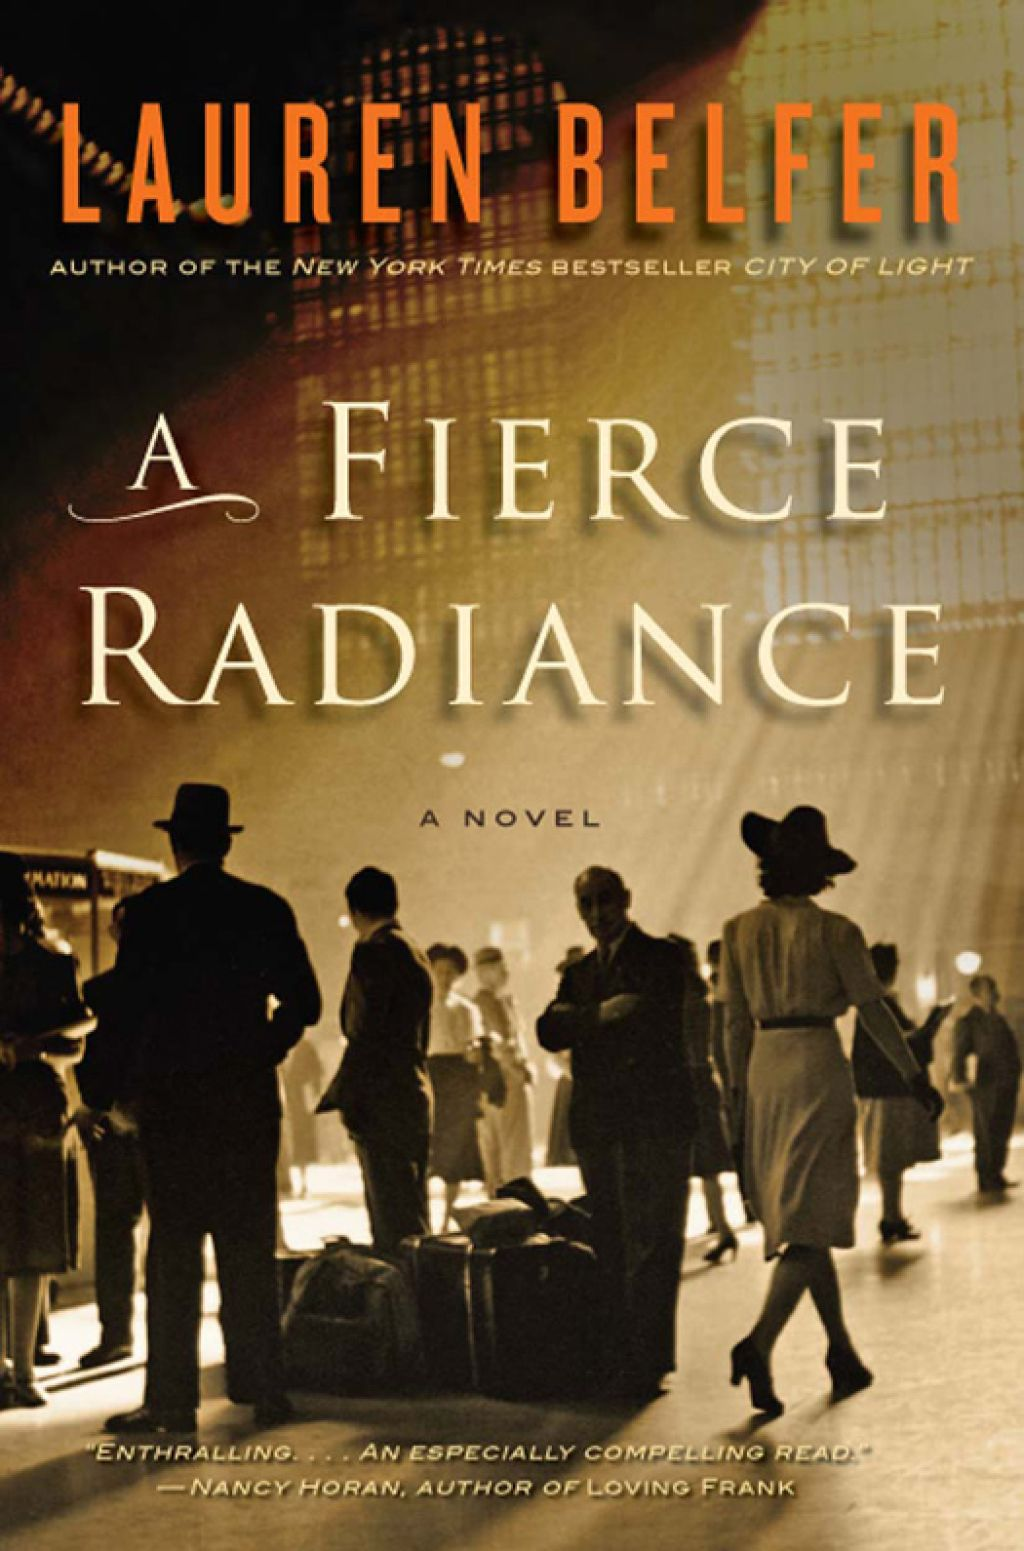 A fierce radiance ebook best historical fiction books